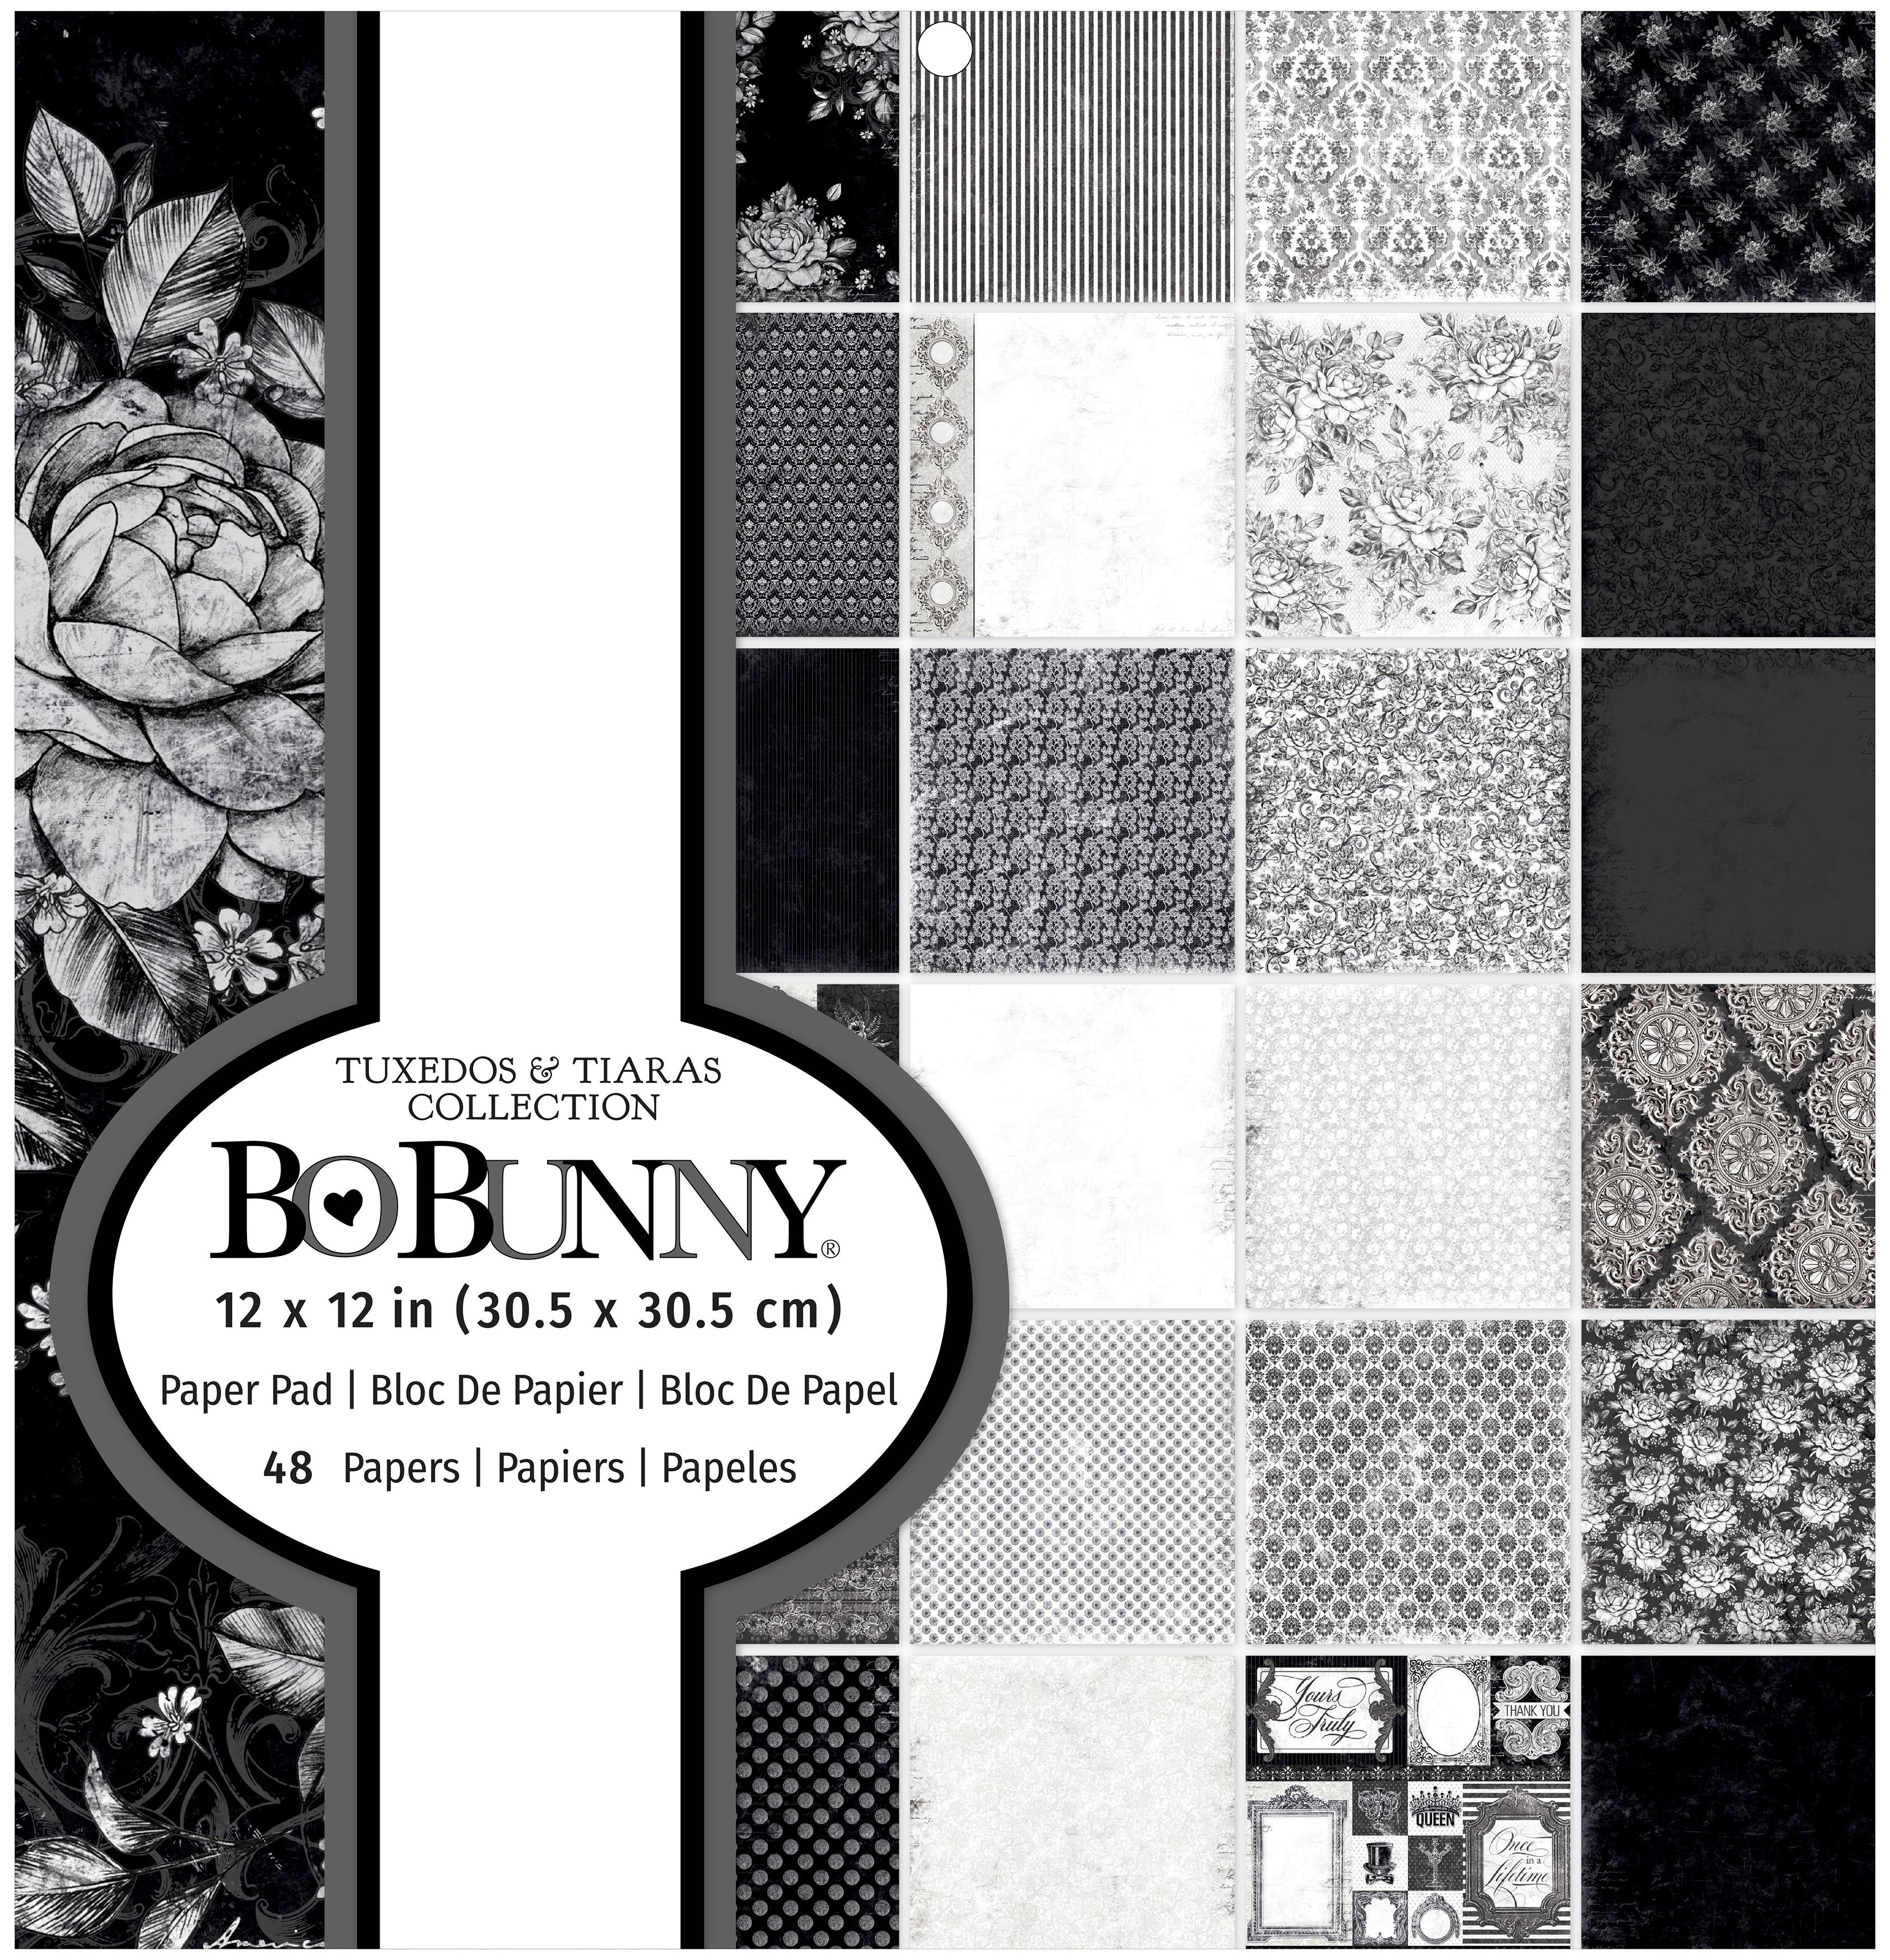 BoBunny Single-Sided Paper Pad 12X12 48/Pkg-Tuxedos & Tiaras